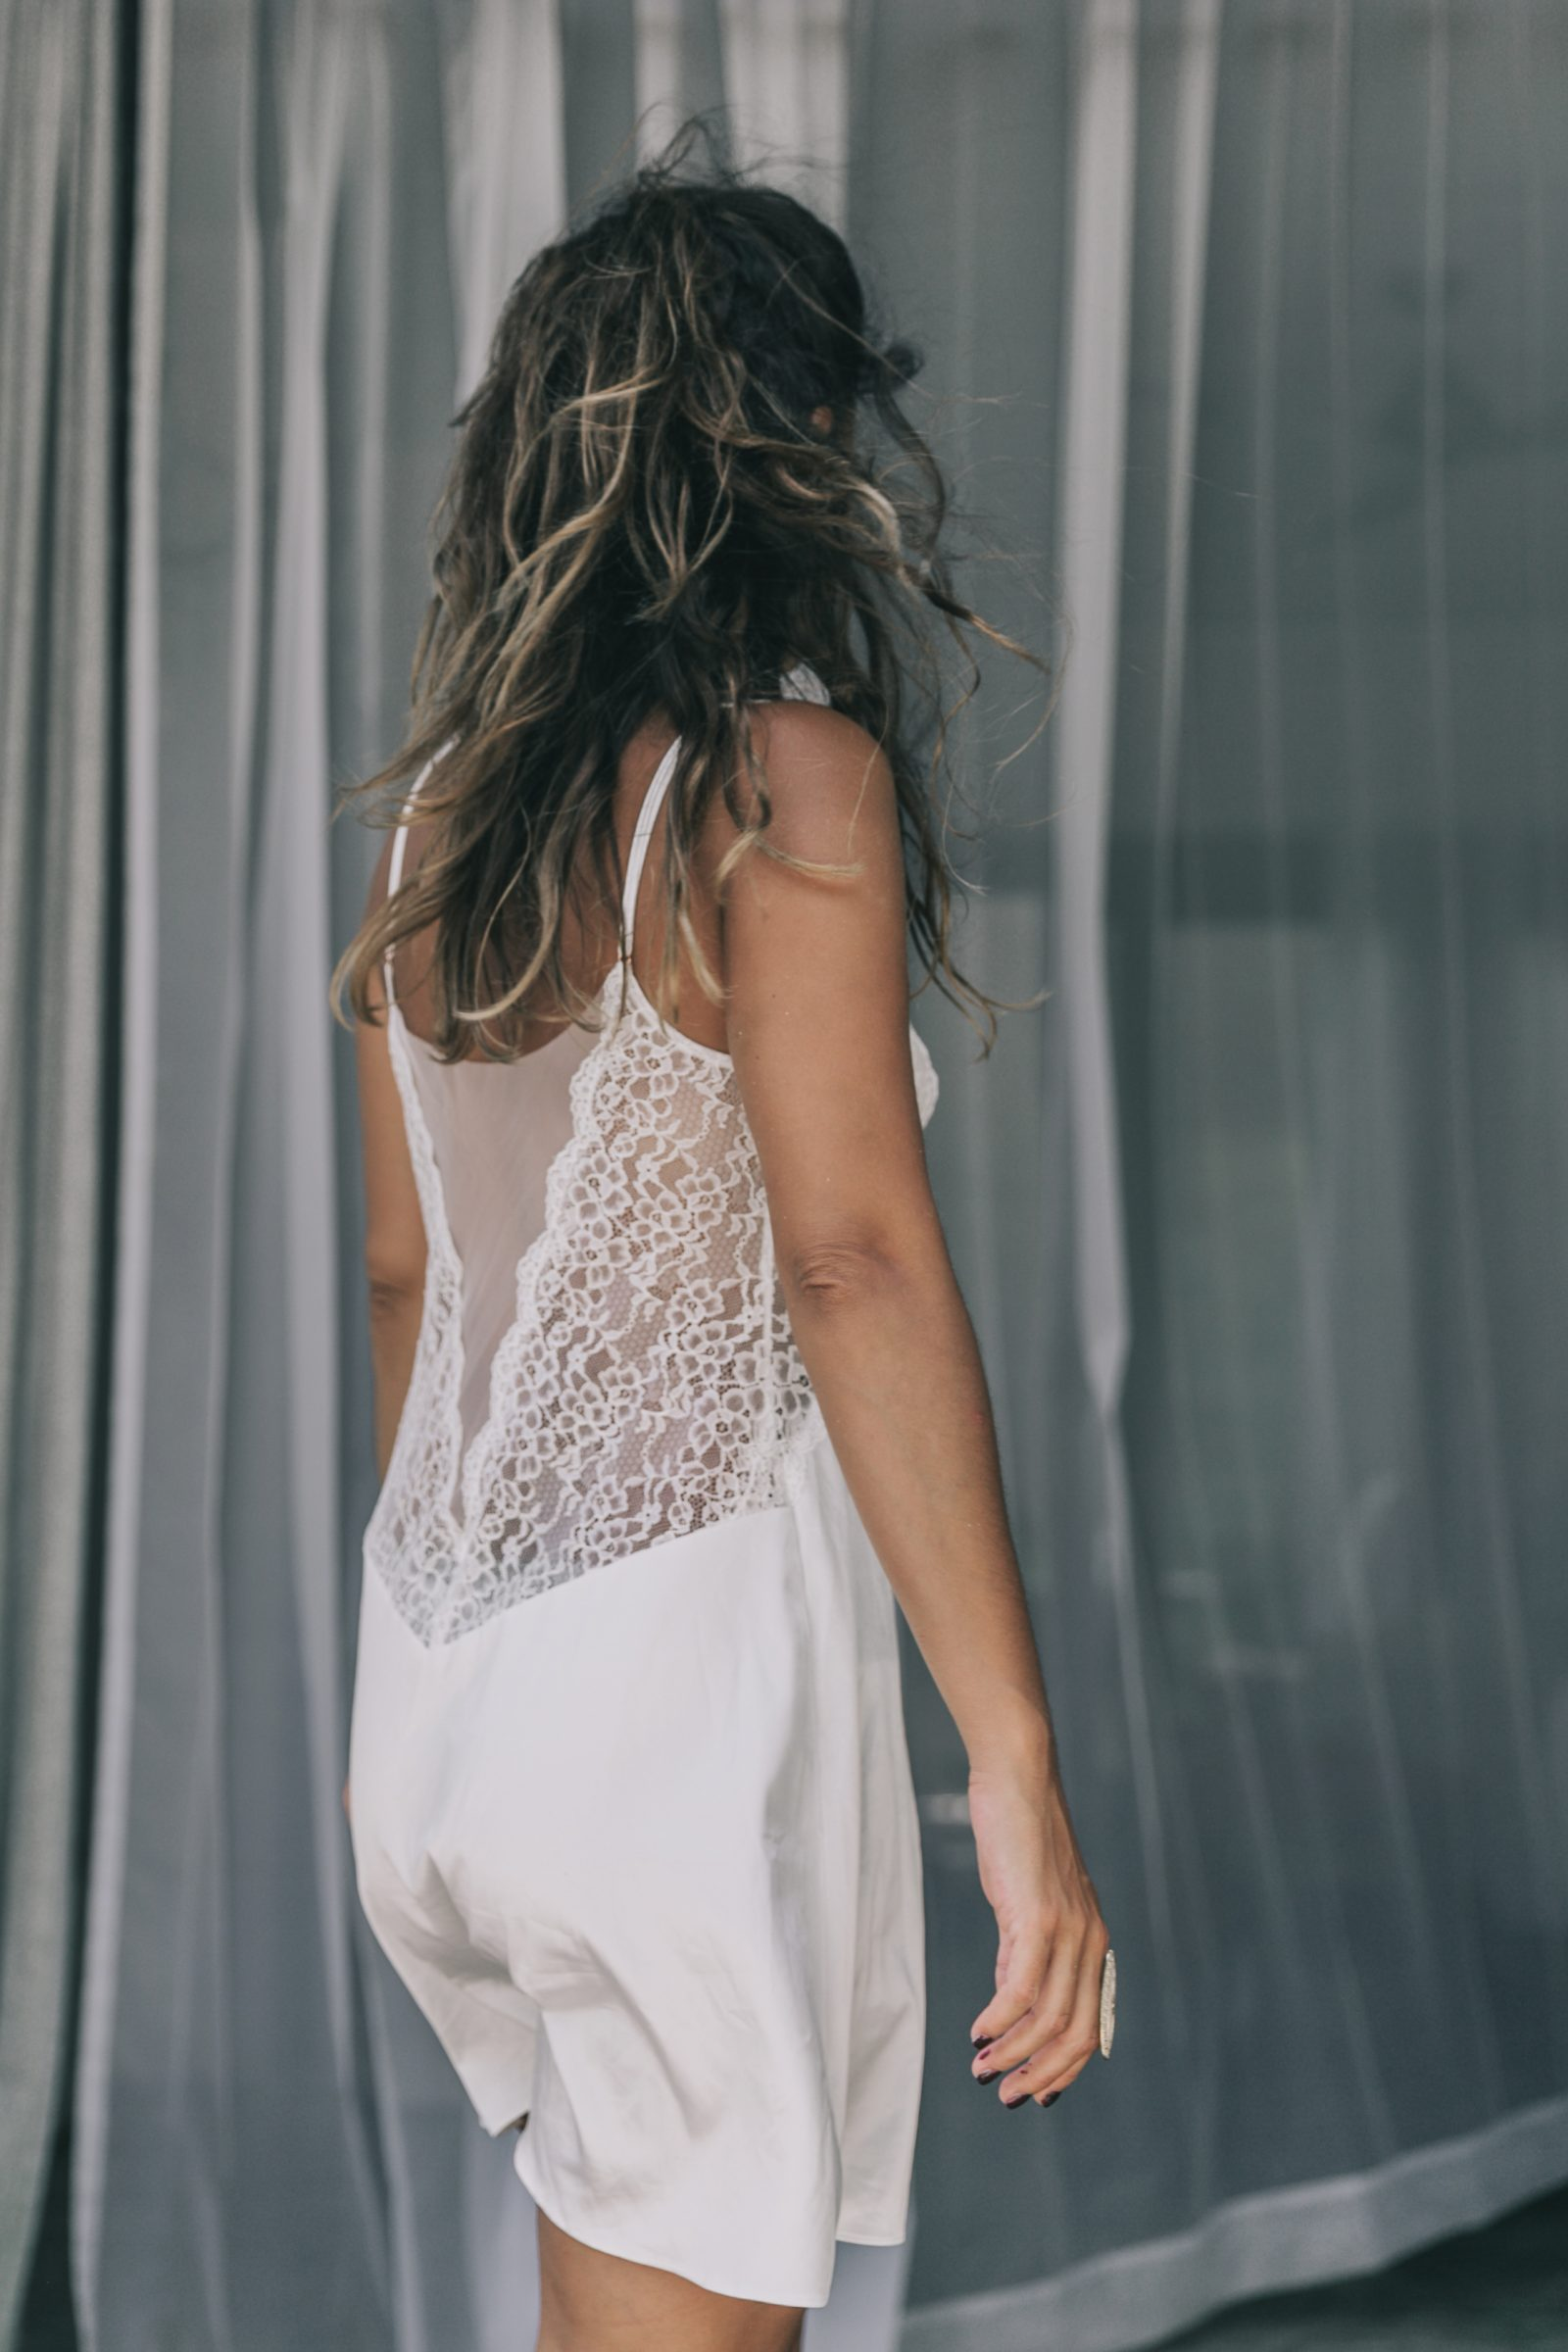 slip_dress-sanara_tulum-beach-mexico-outfit-collage_vintage-96